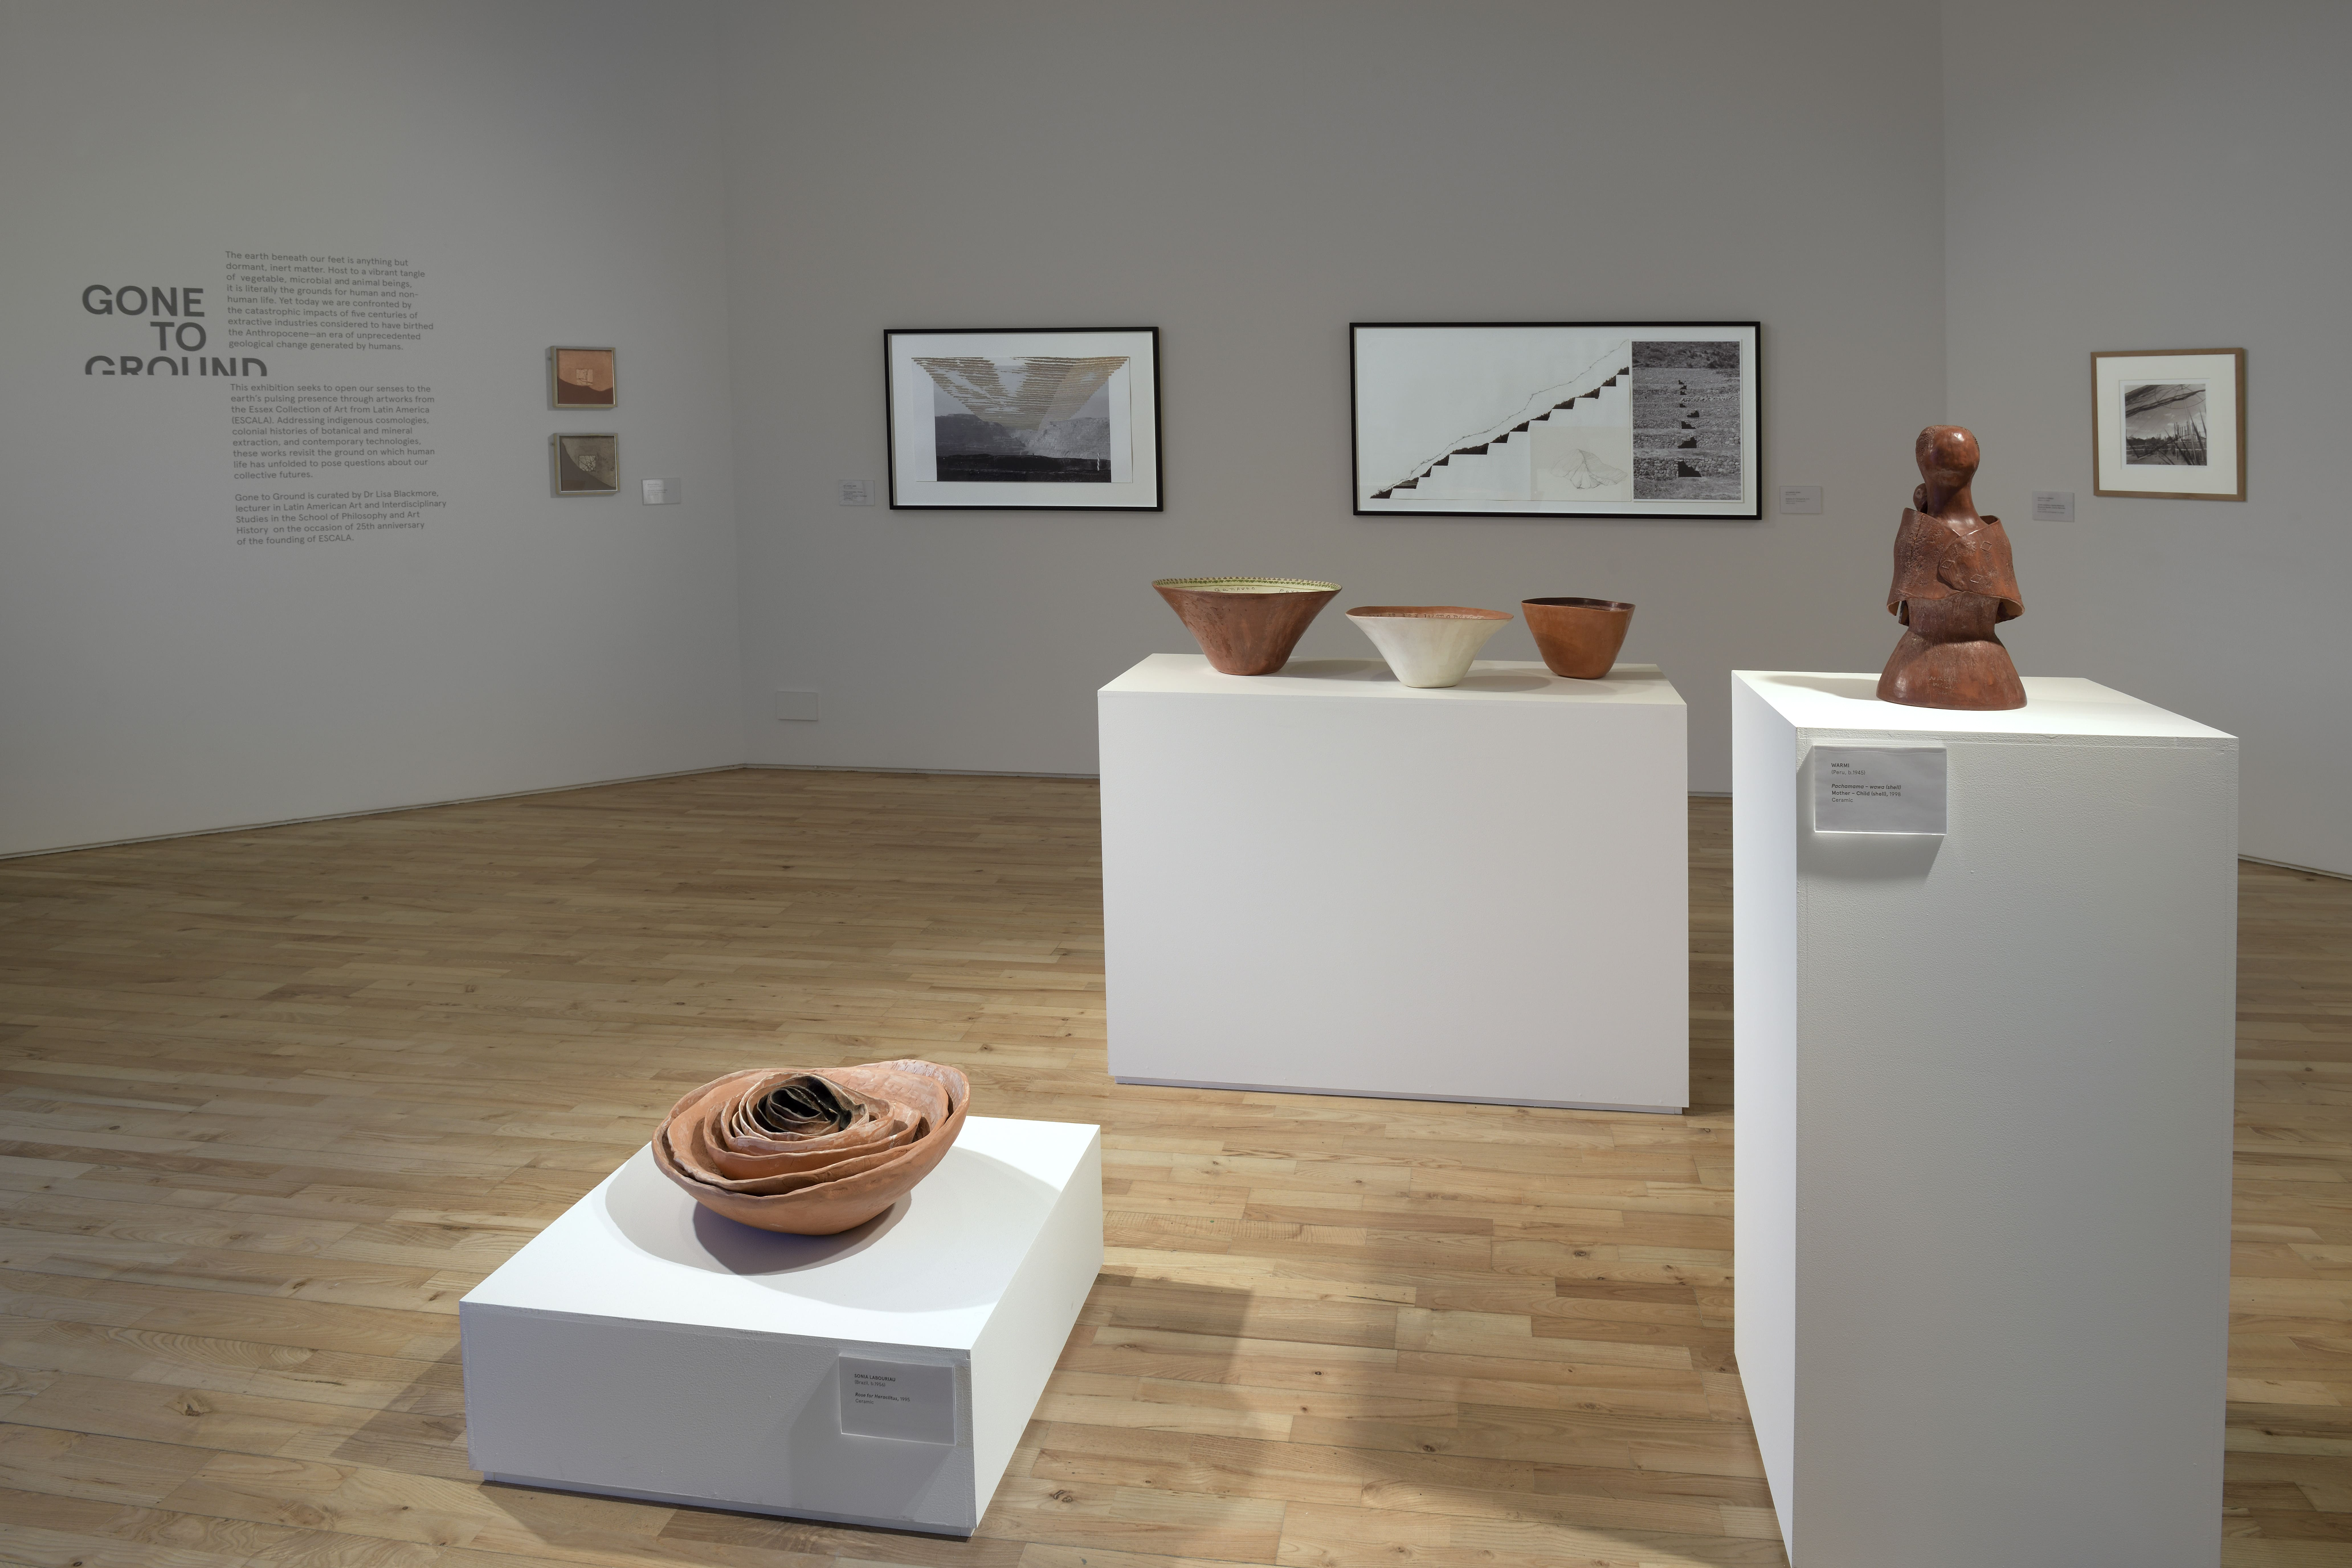 Gone to Ground exhibition at Art Exchange